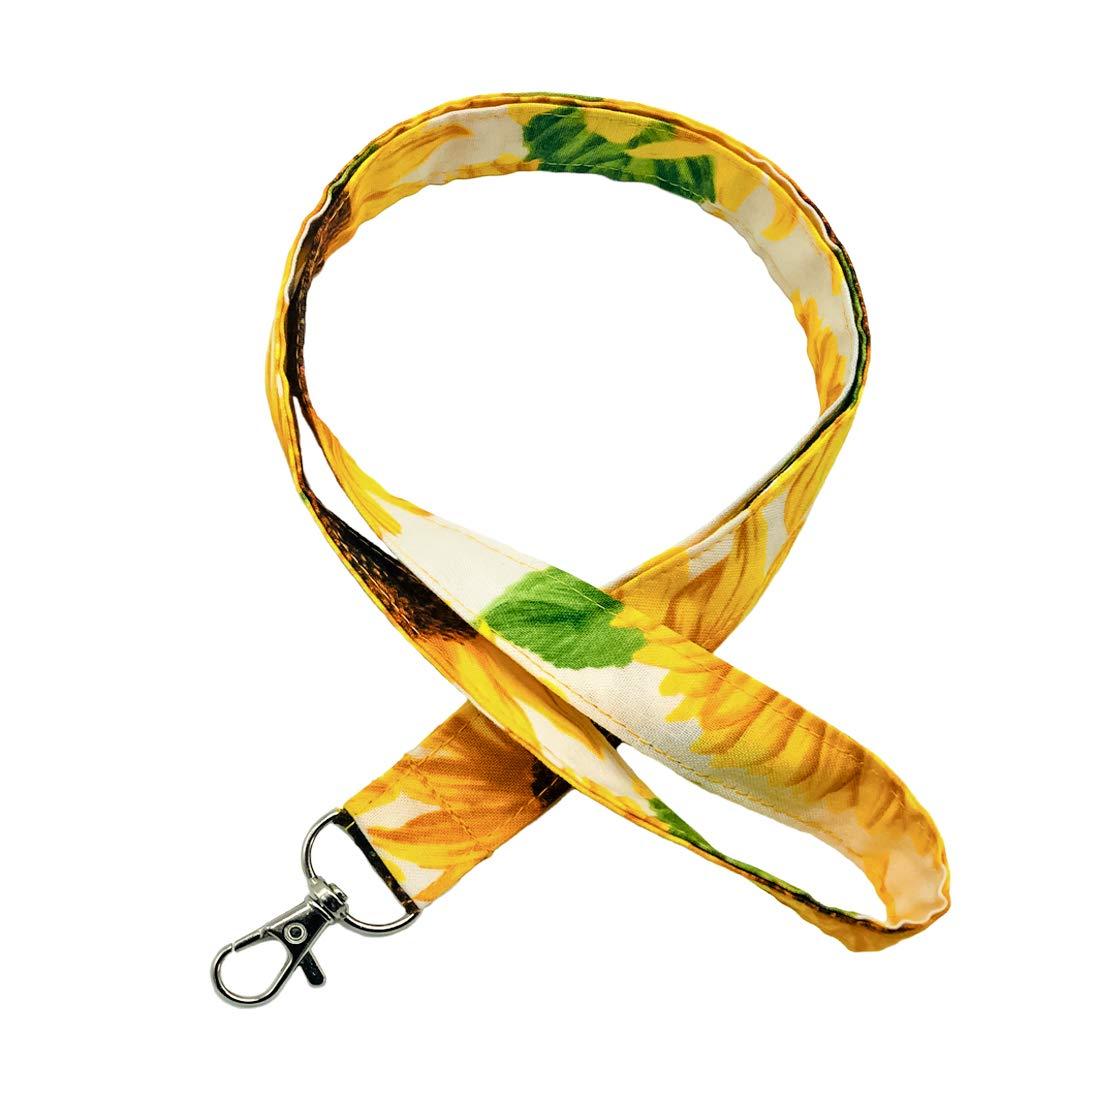 LNKRE JEWELRY Sunflower Lanyard Skinny Fabric Soft Neck Strap Cotton Fabric Pretty Keychain Lanyard,ID Badge Holder,Key Fob for Wallet,Cell Phone,Teacher,Women,Girls